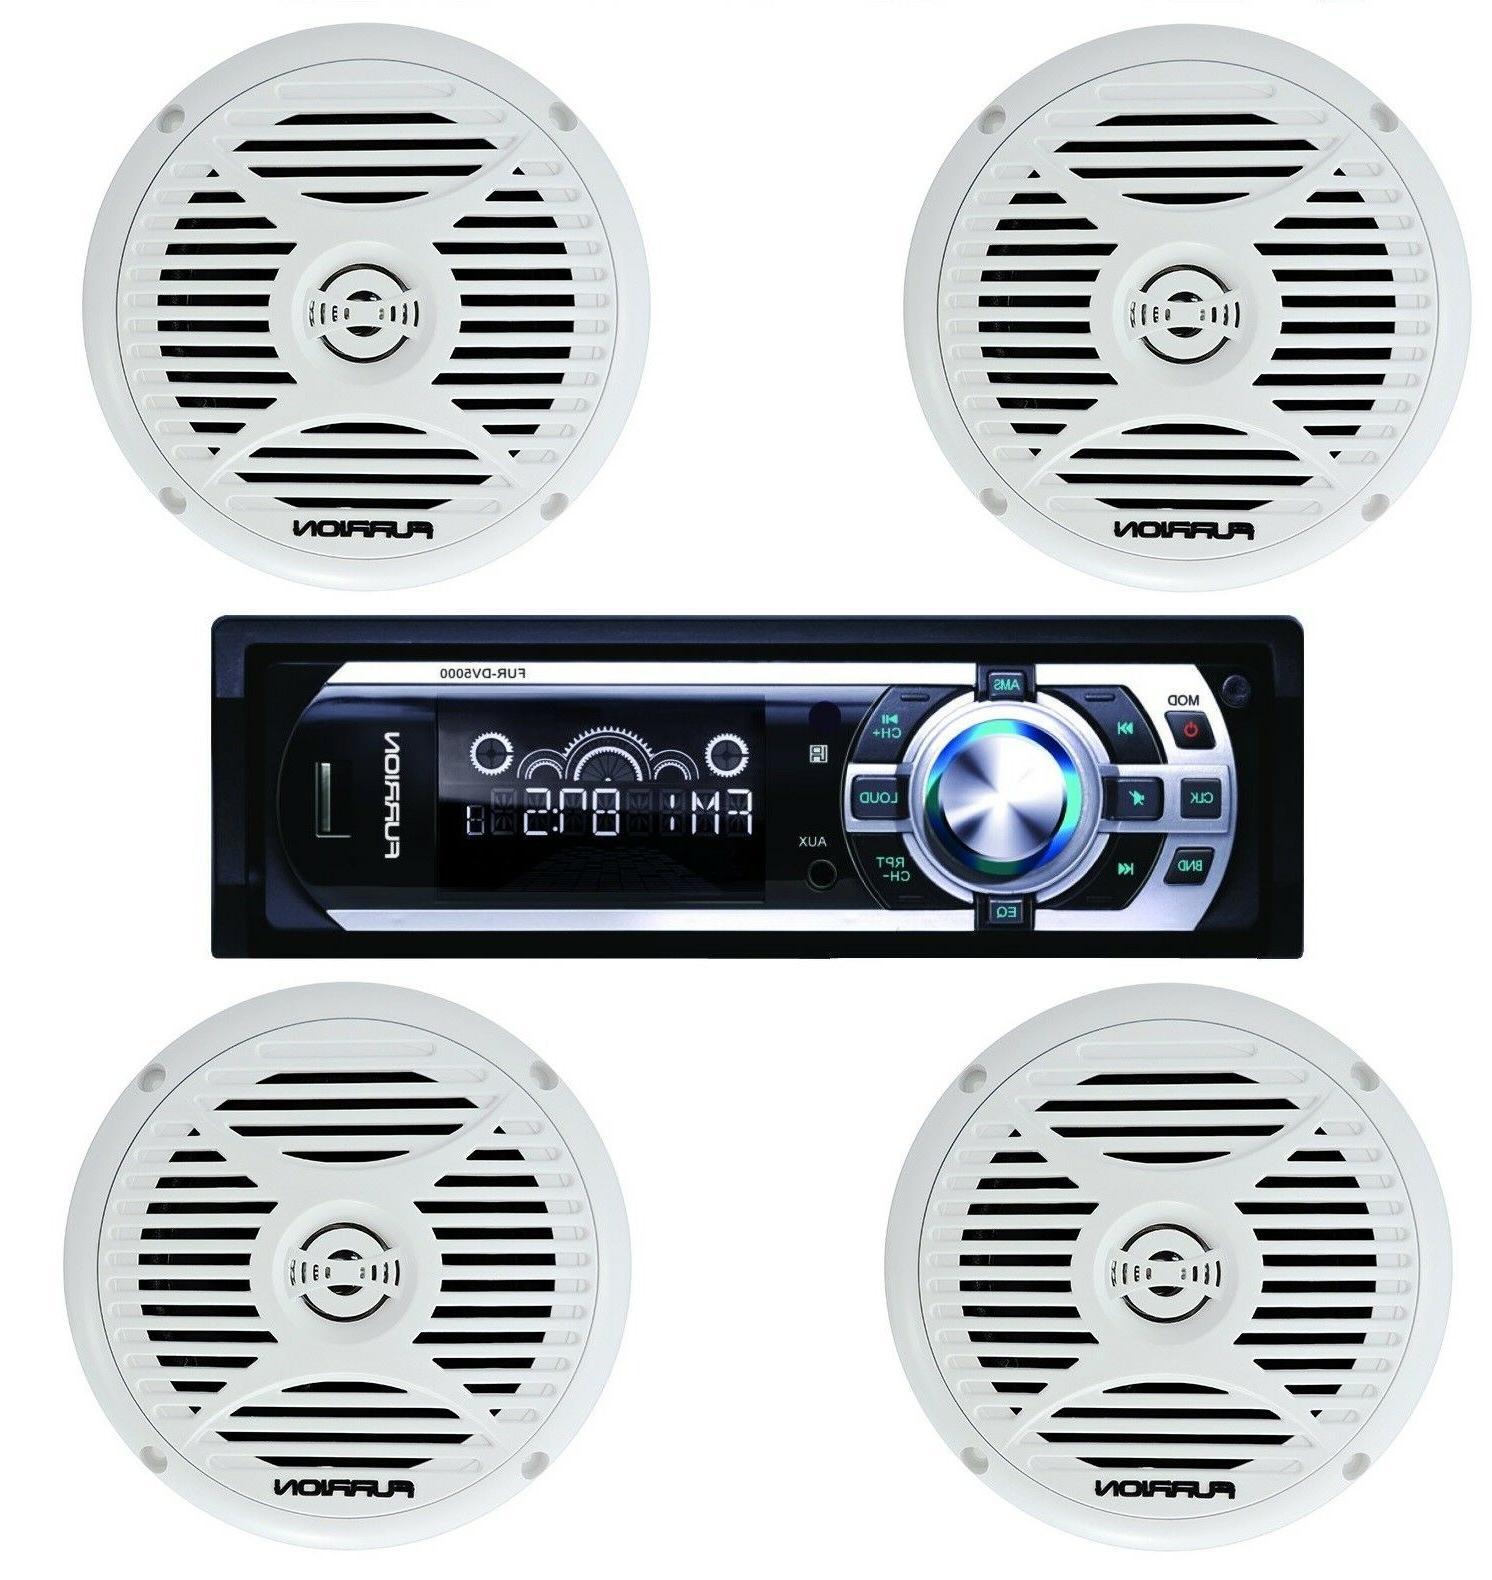 new dv5000 am fm radio cd player